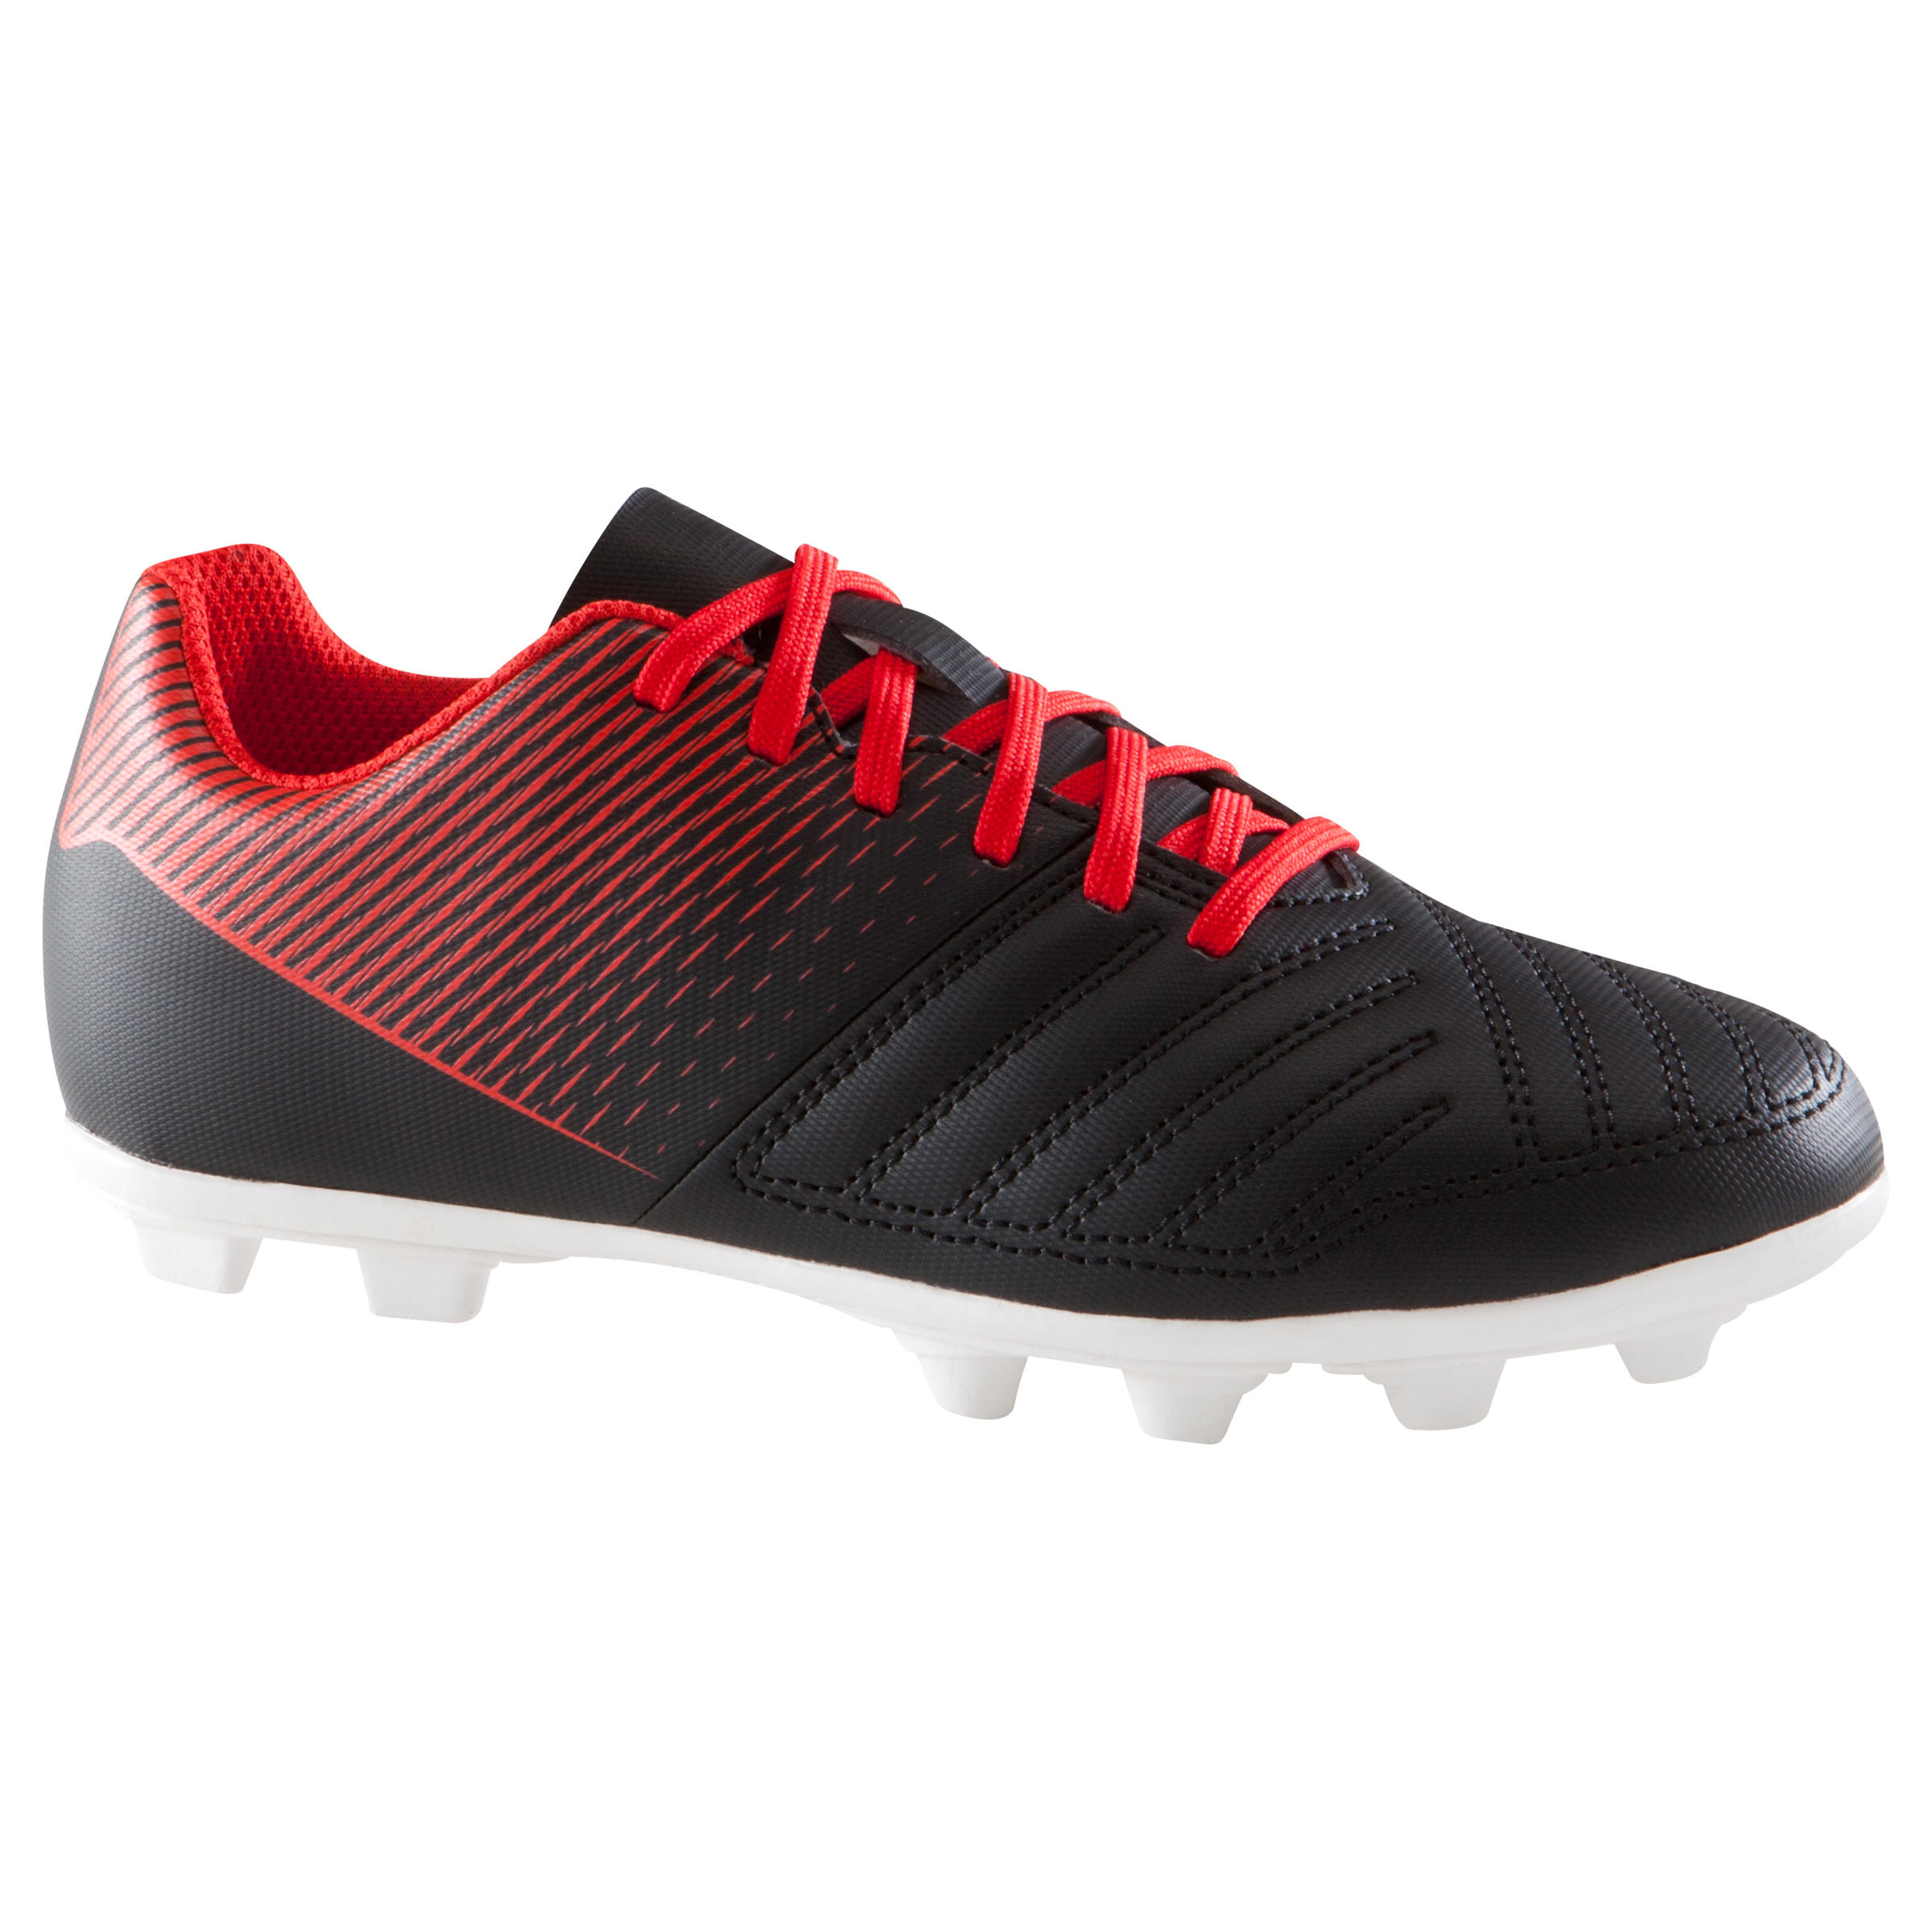 De Enfants De Football Chaussures Football Adulteamp; Chaussures Yb7yvI6mfg